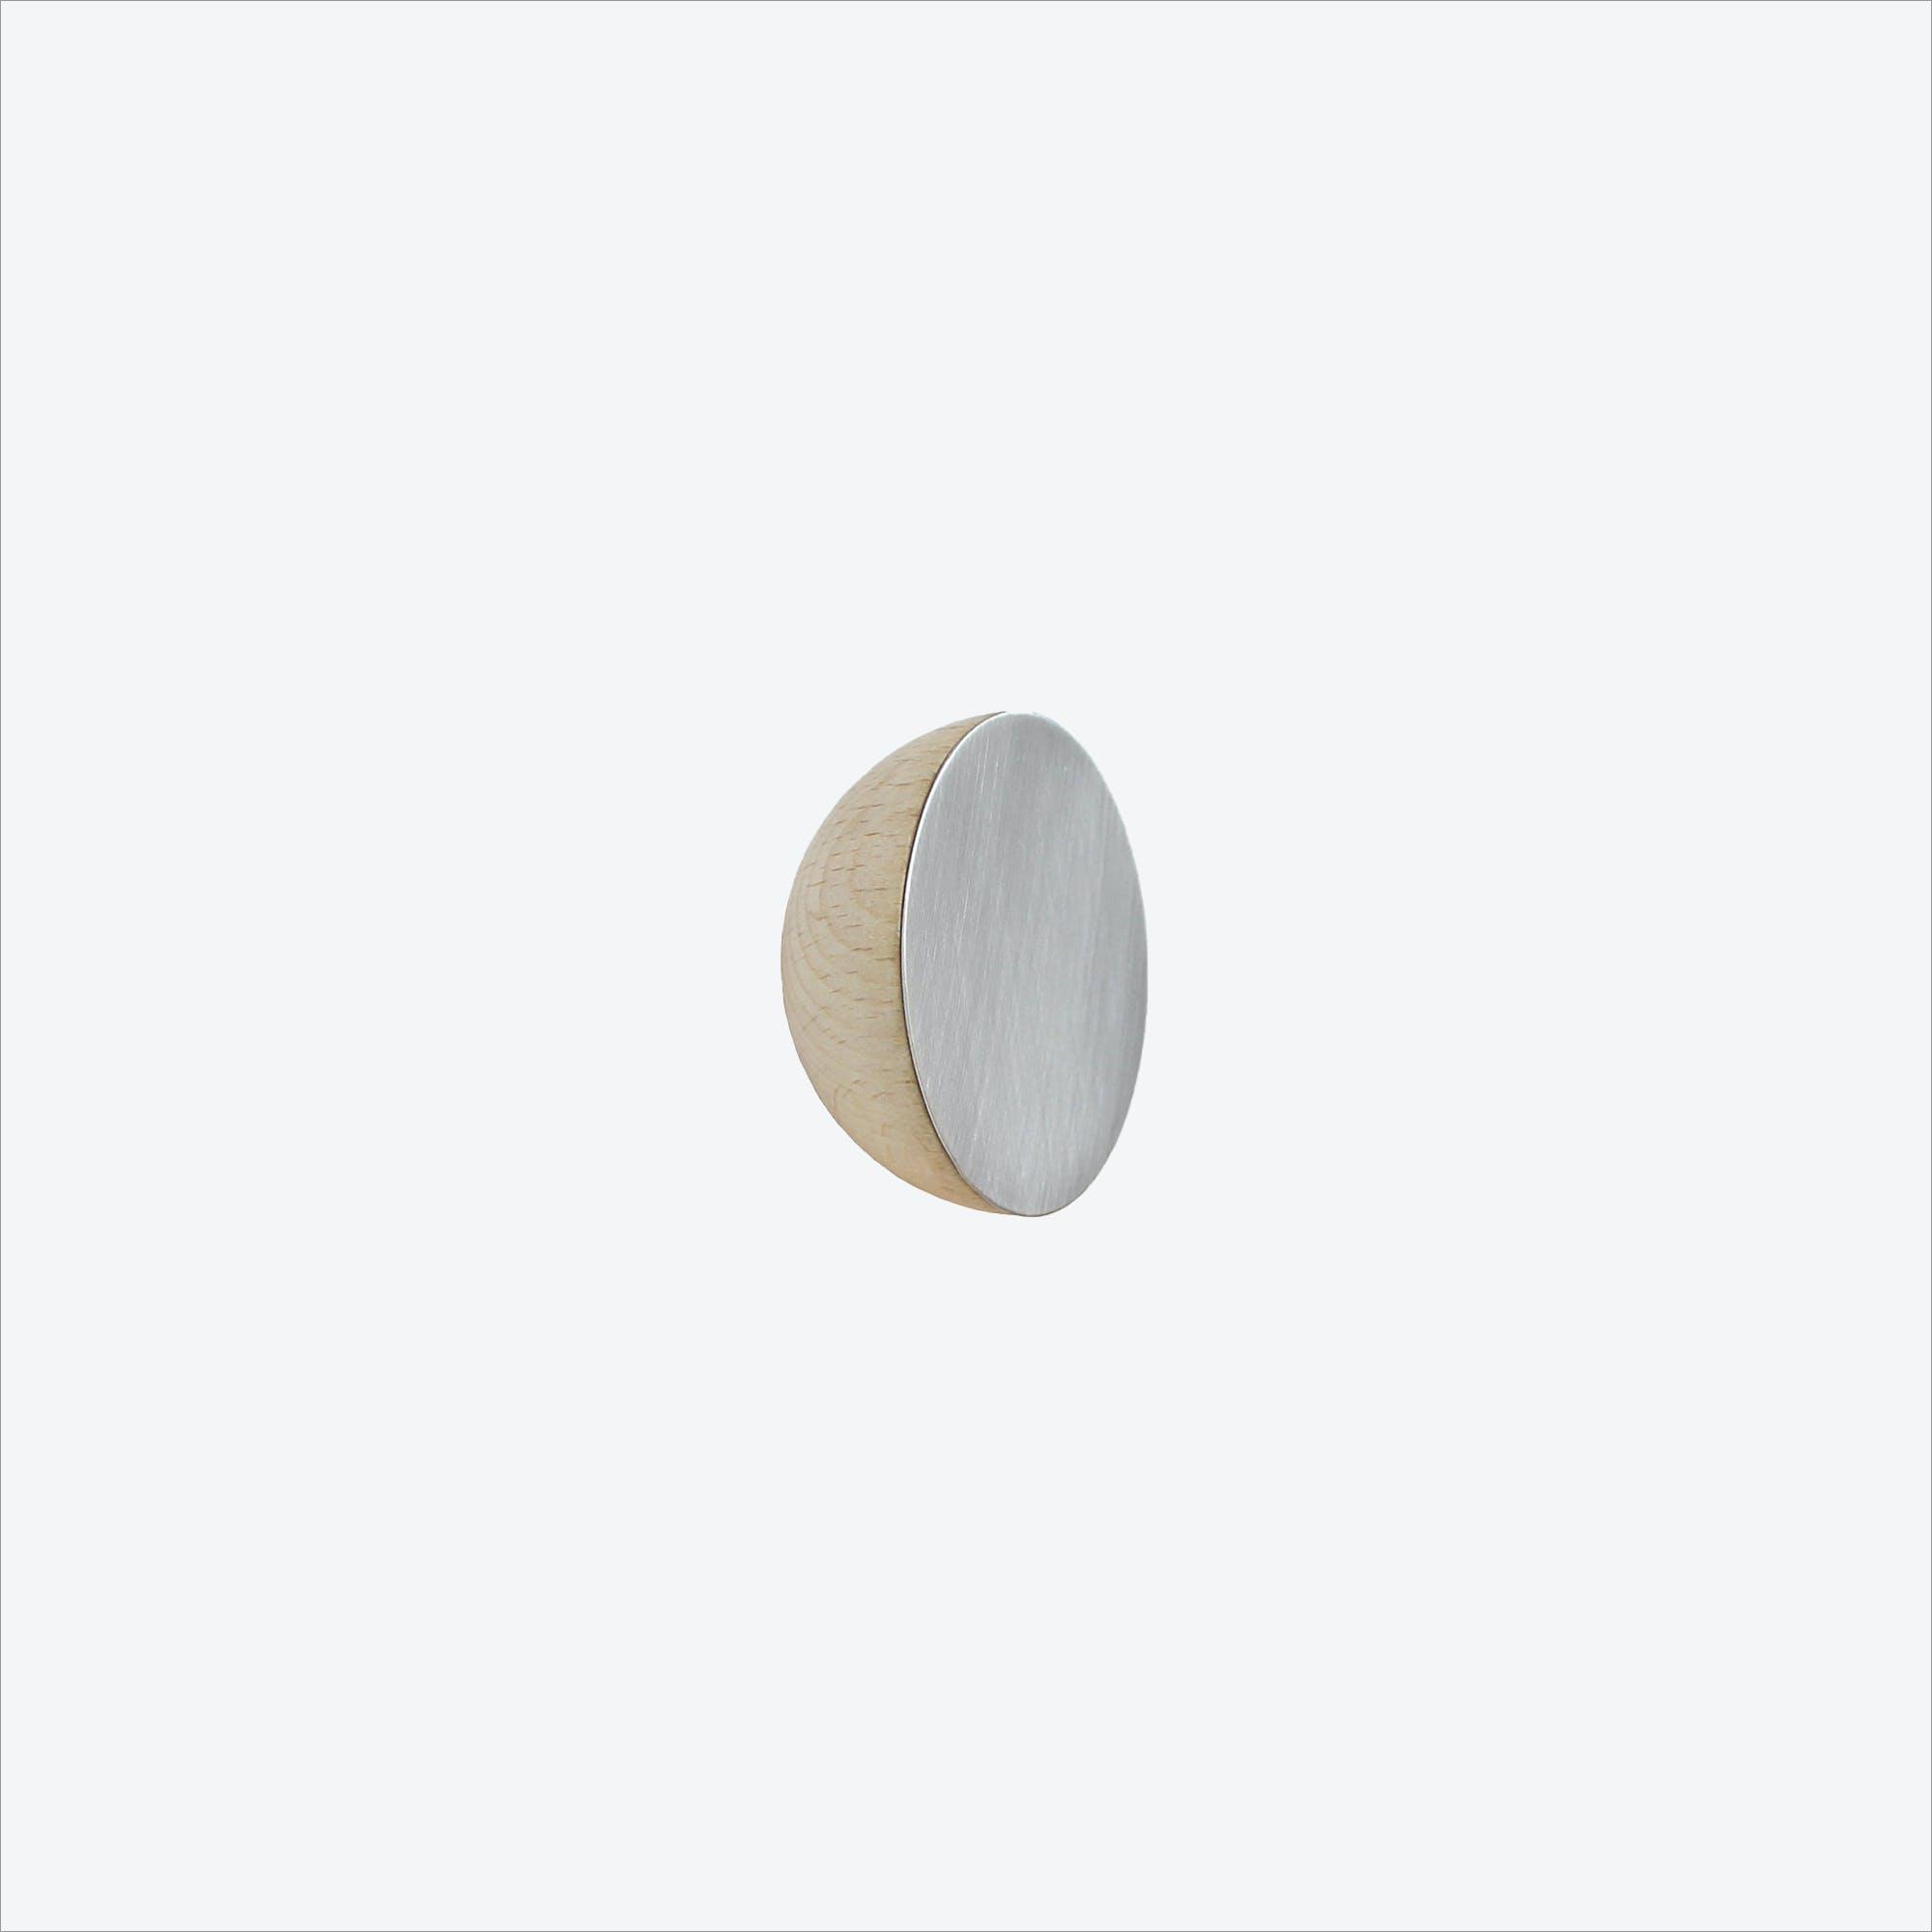 Round Beech Wood & Aluminium Wall Hook